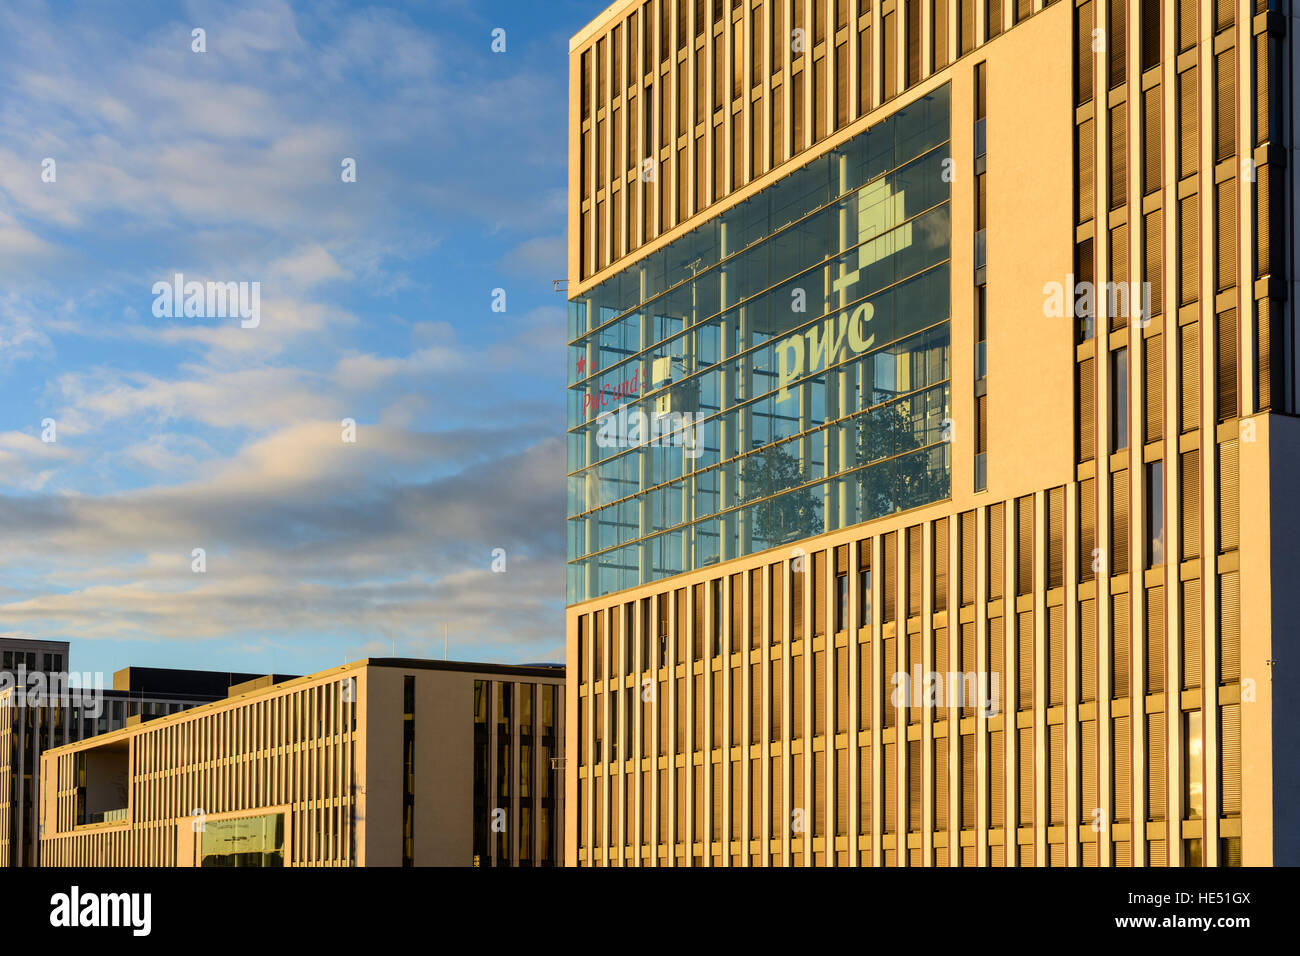 München, Munich: PricewaterhouseCoopers (PwC) office building, Oberbayern, Upper Bavaria, Bayern, Bavaria, - Stock Image